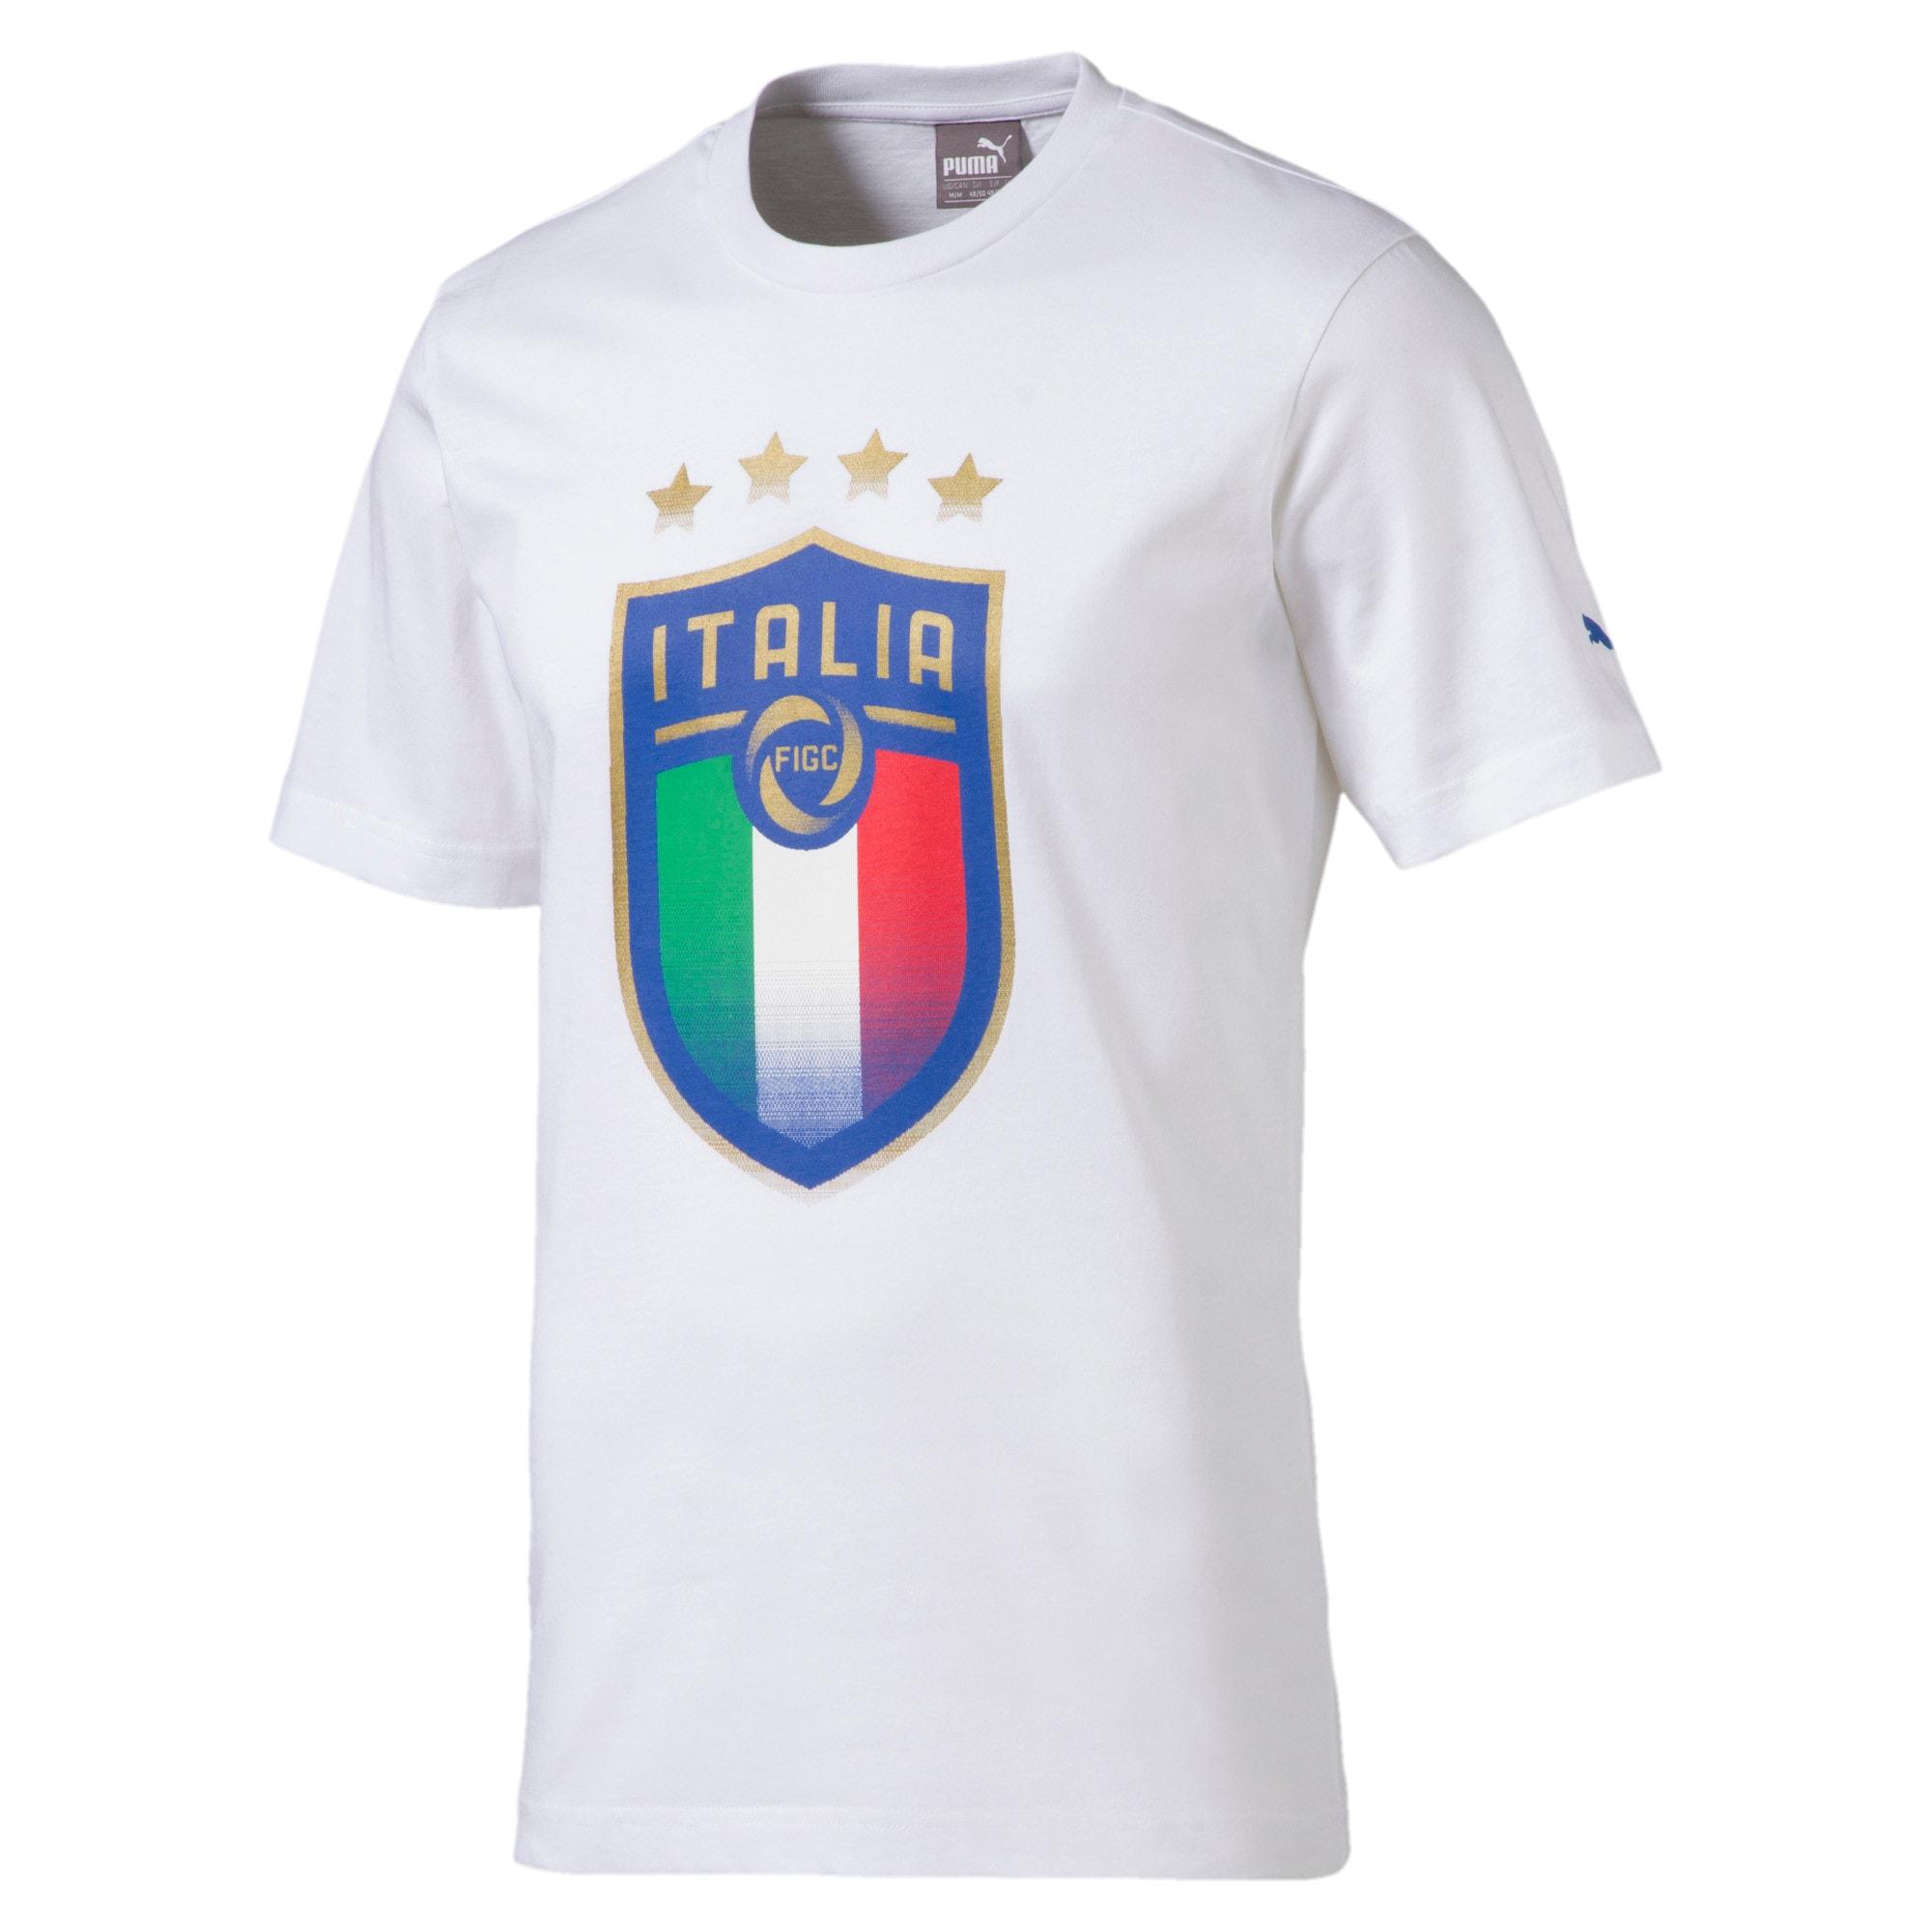 Thumbnail 1 of Italia Badge Tee, Puma White, medium